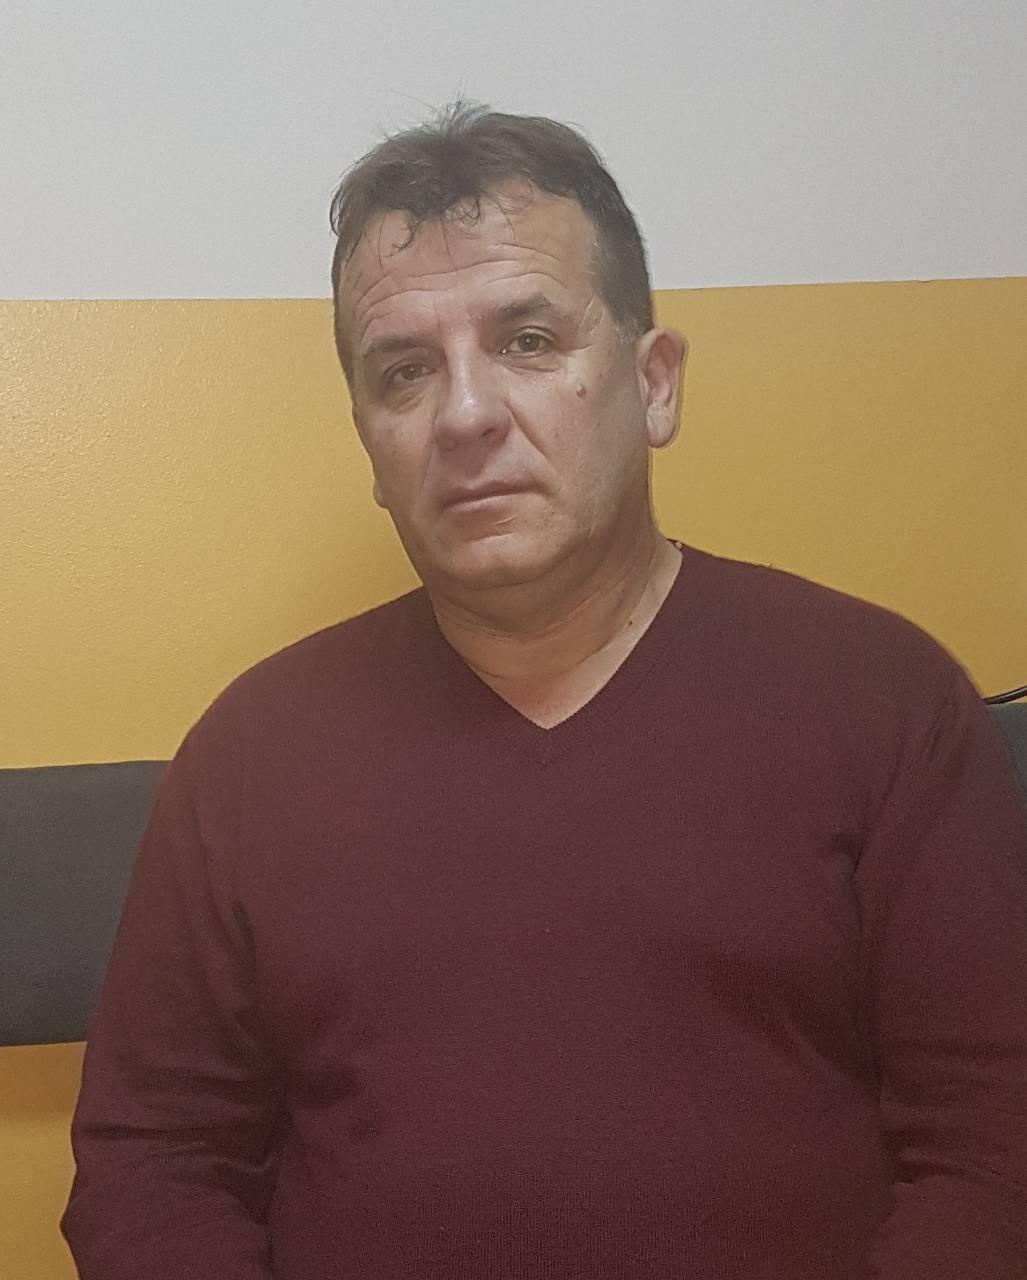 Esat Mujezinović